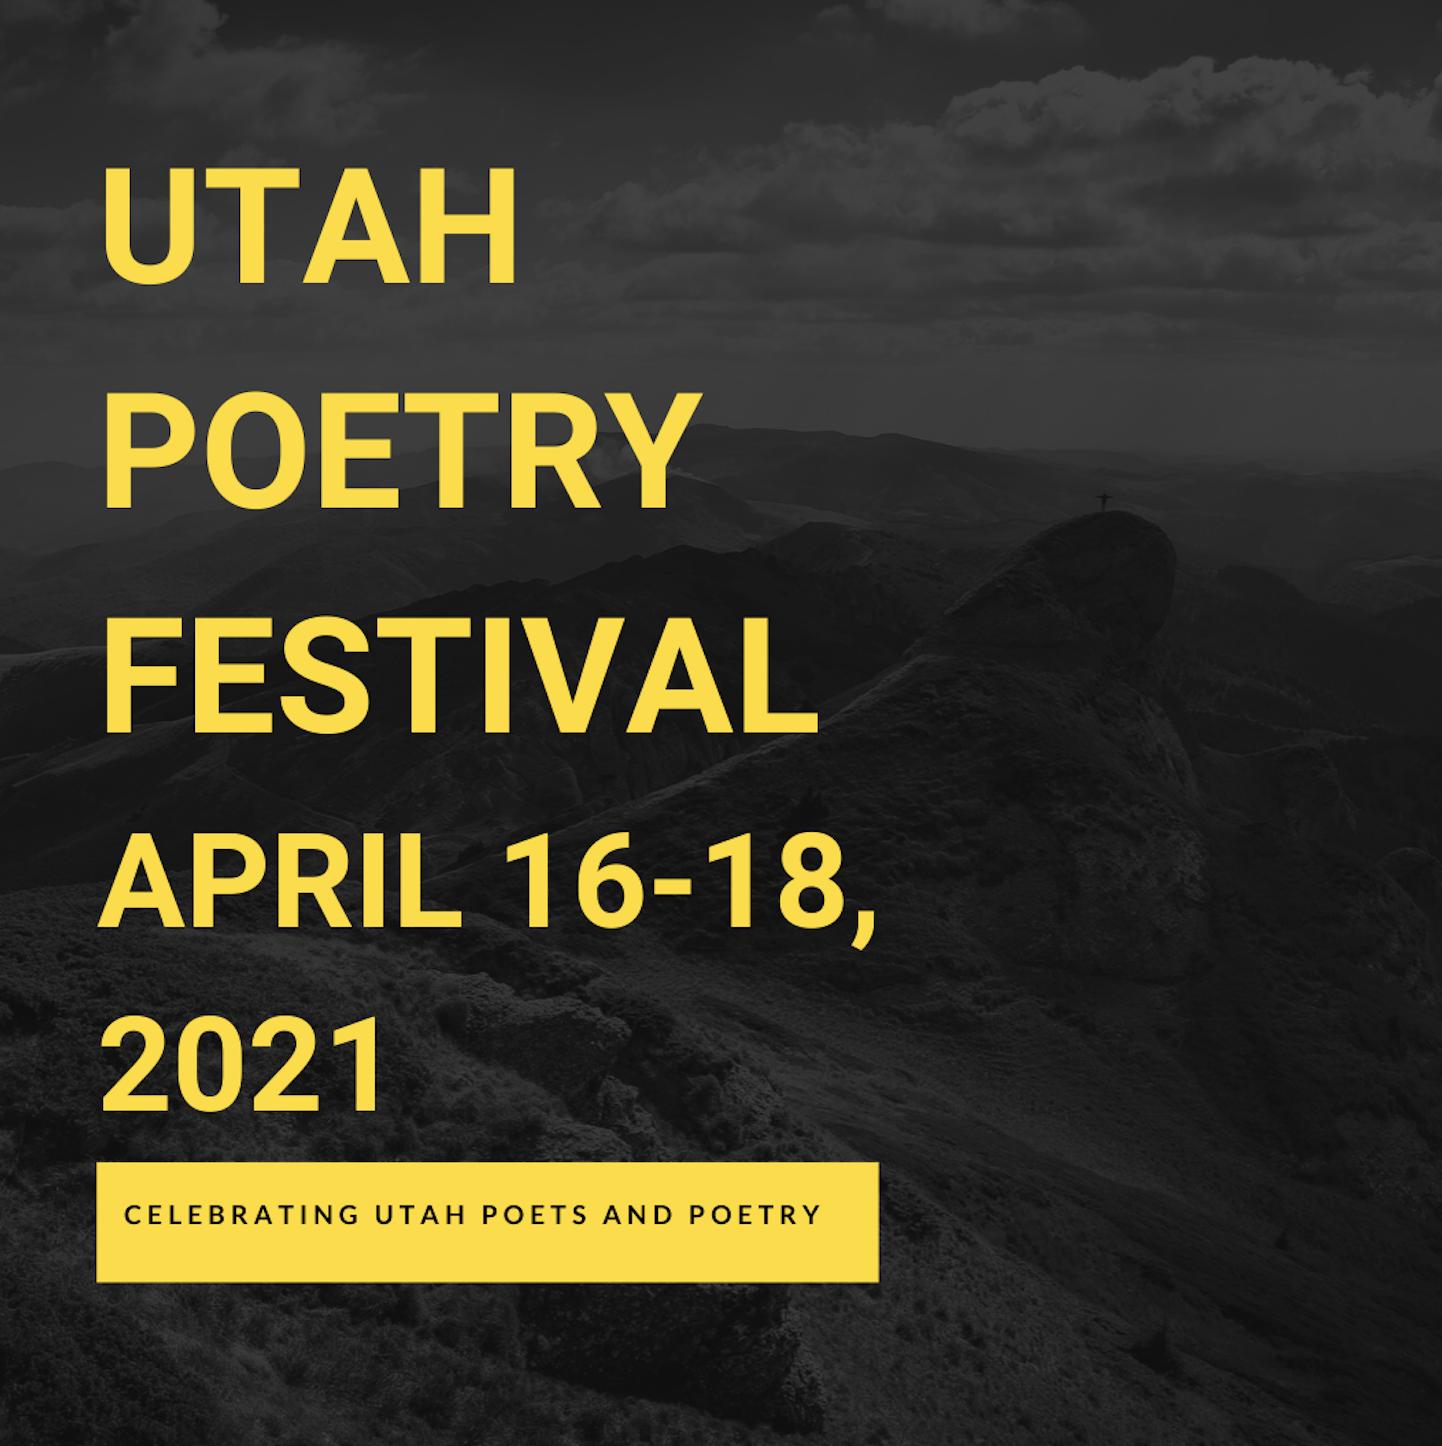 The Utah Poetry Festival